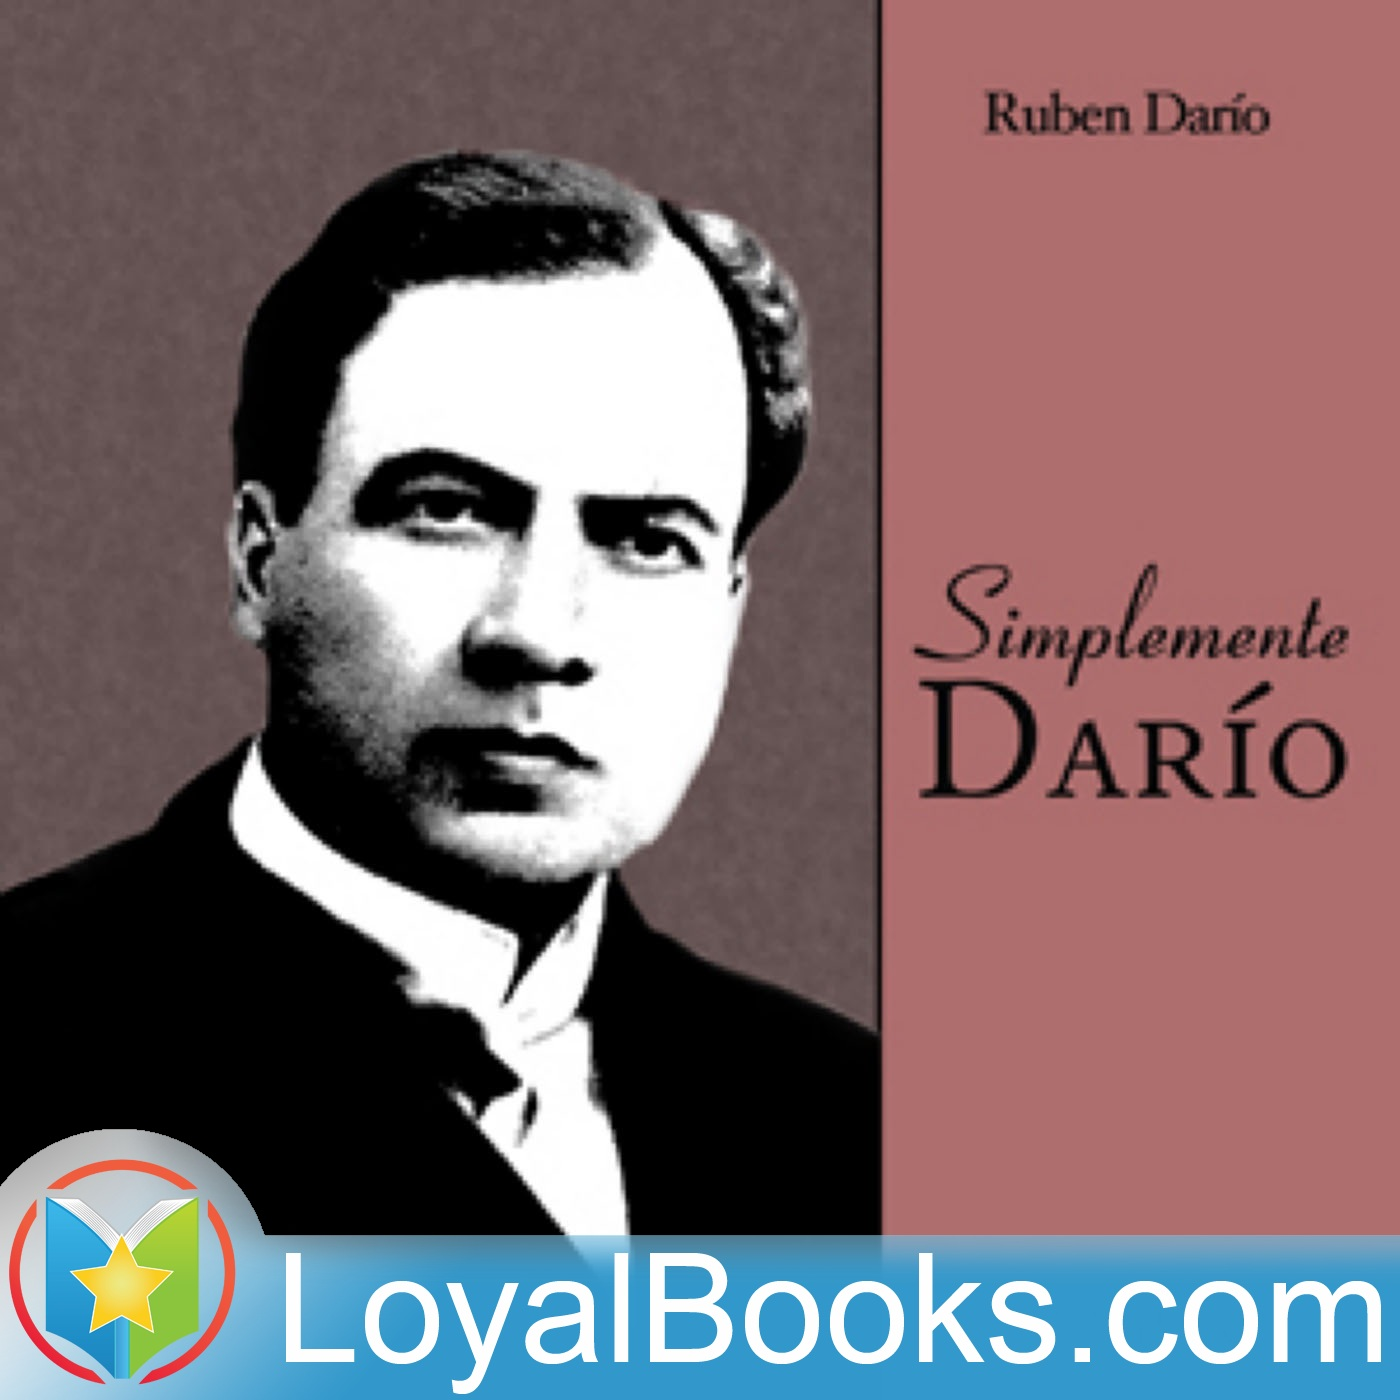 <![CDATA[Simplemente  Darío by Ruben Darío]]>